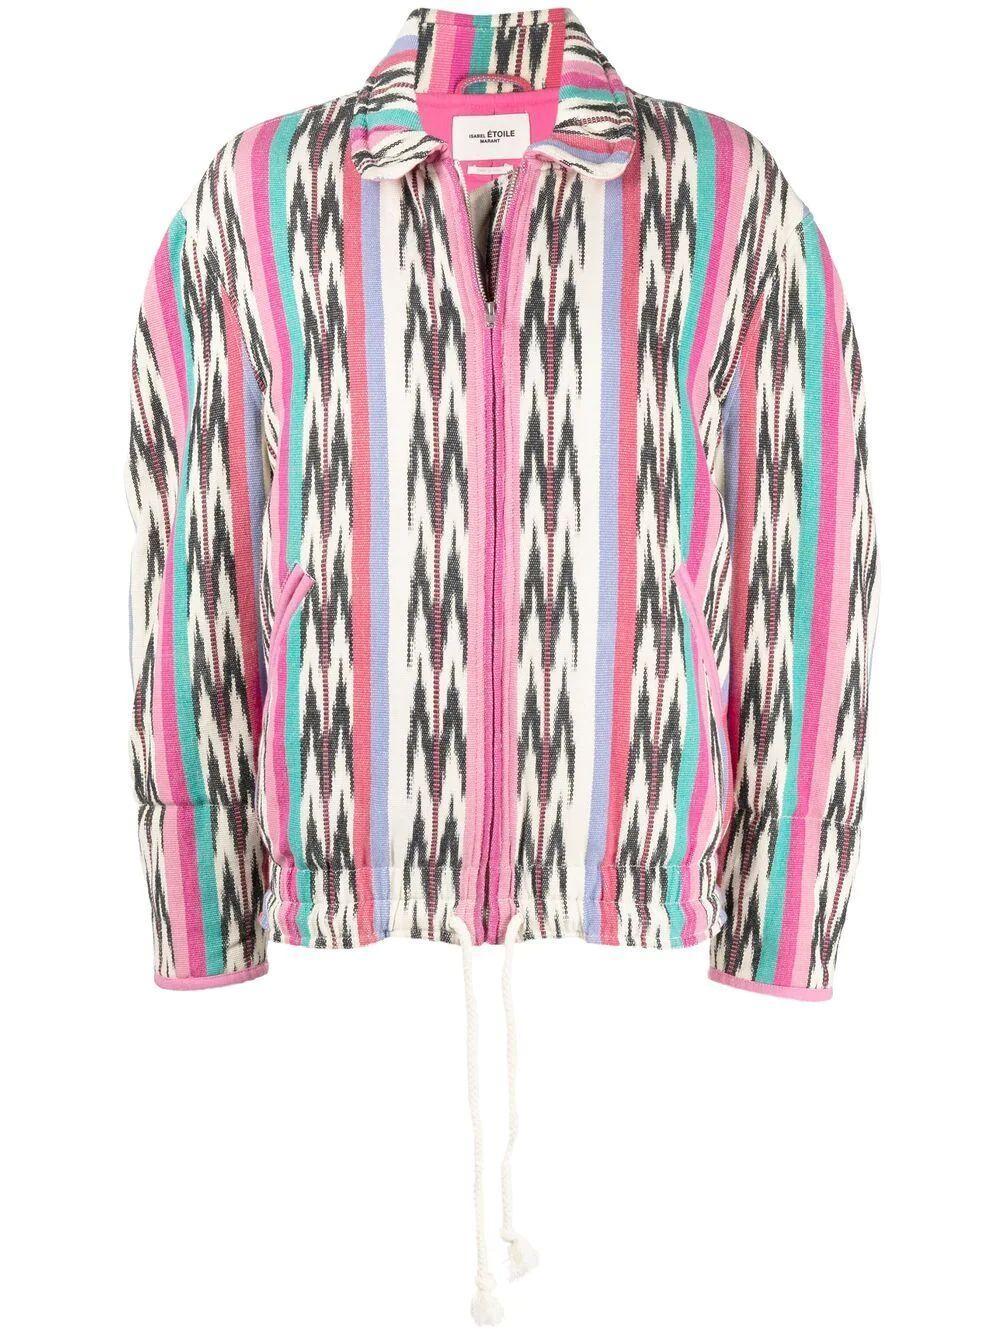 Laustey Jacquard Cotton Jacket